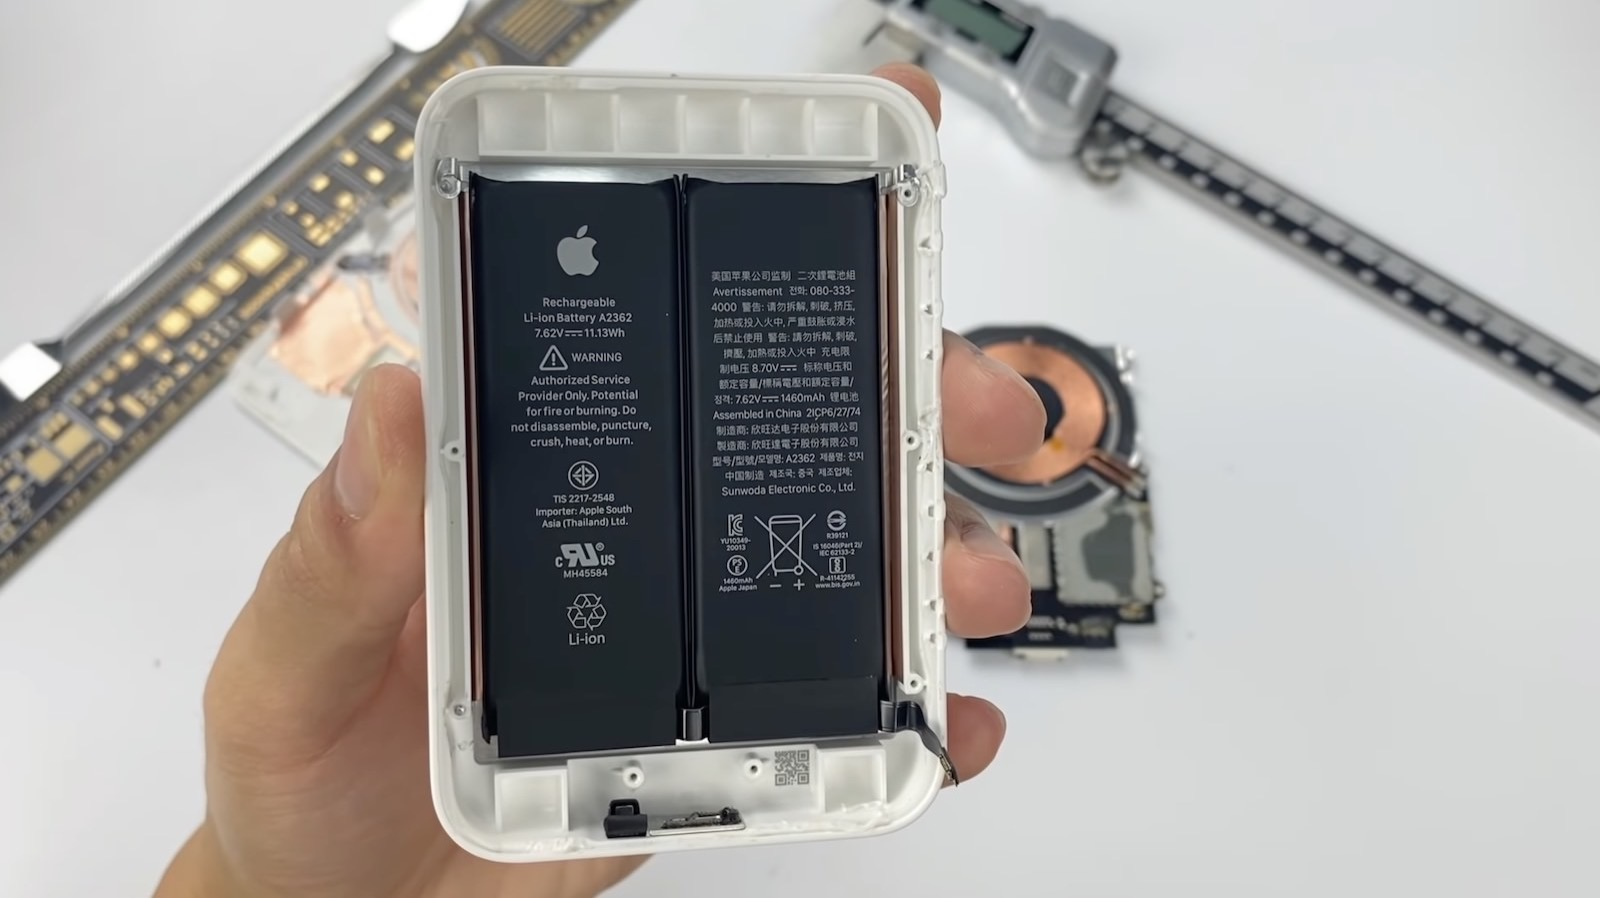 Magsafe battery pack teardown